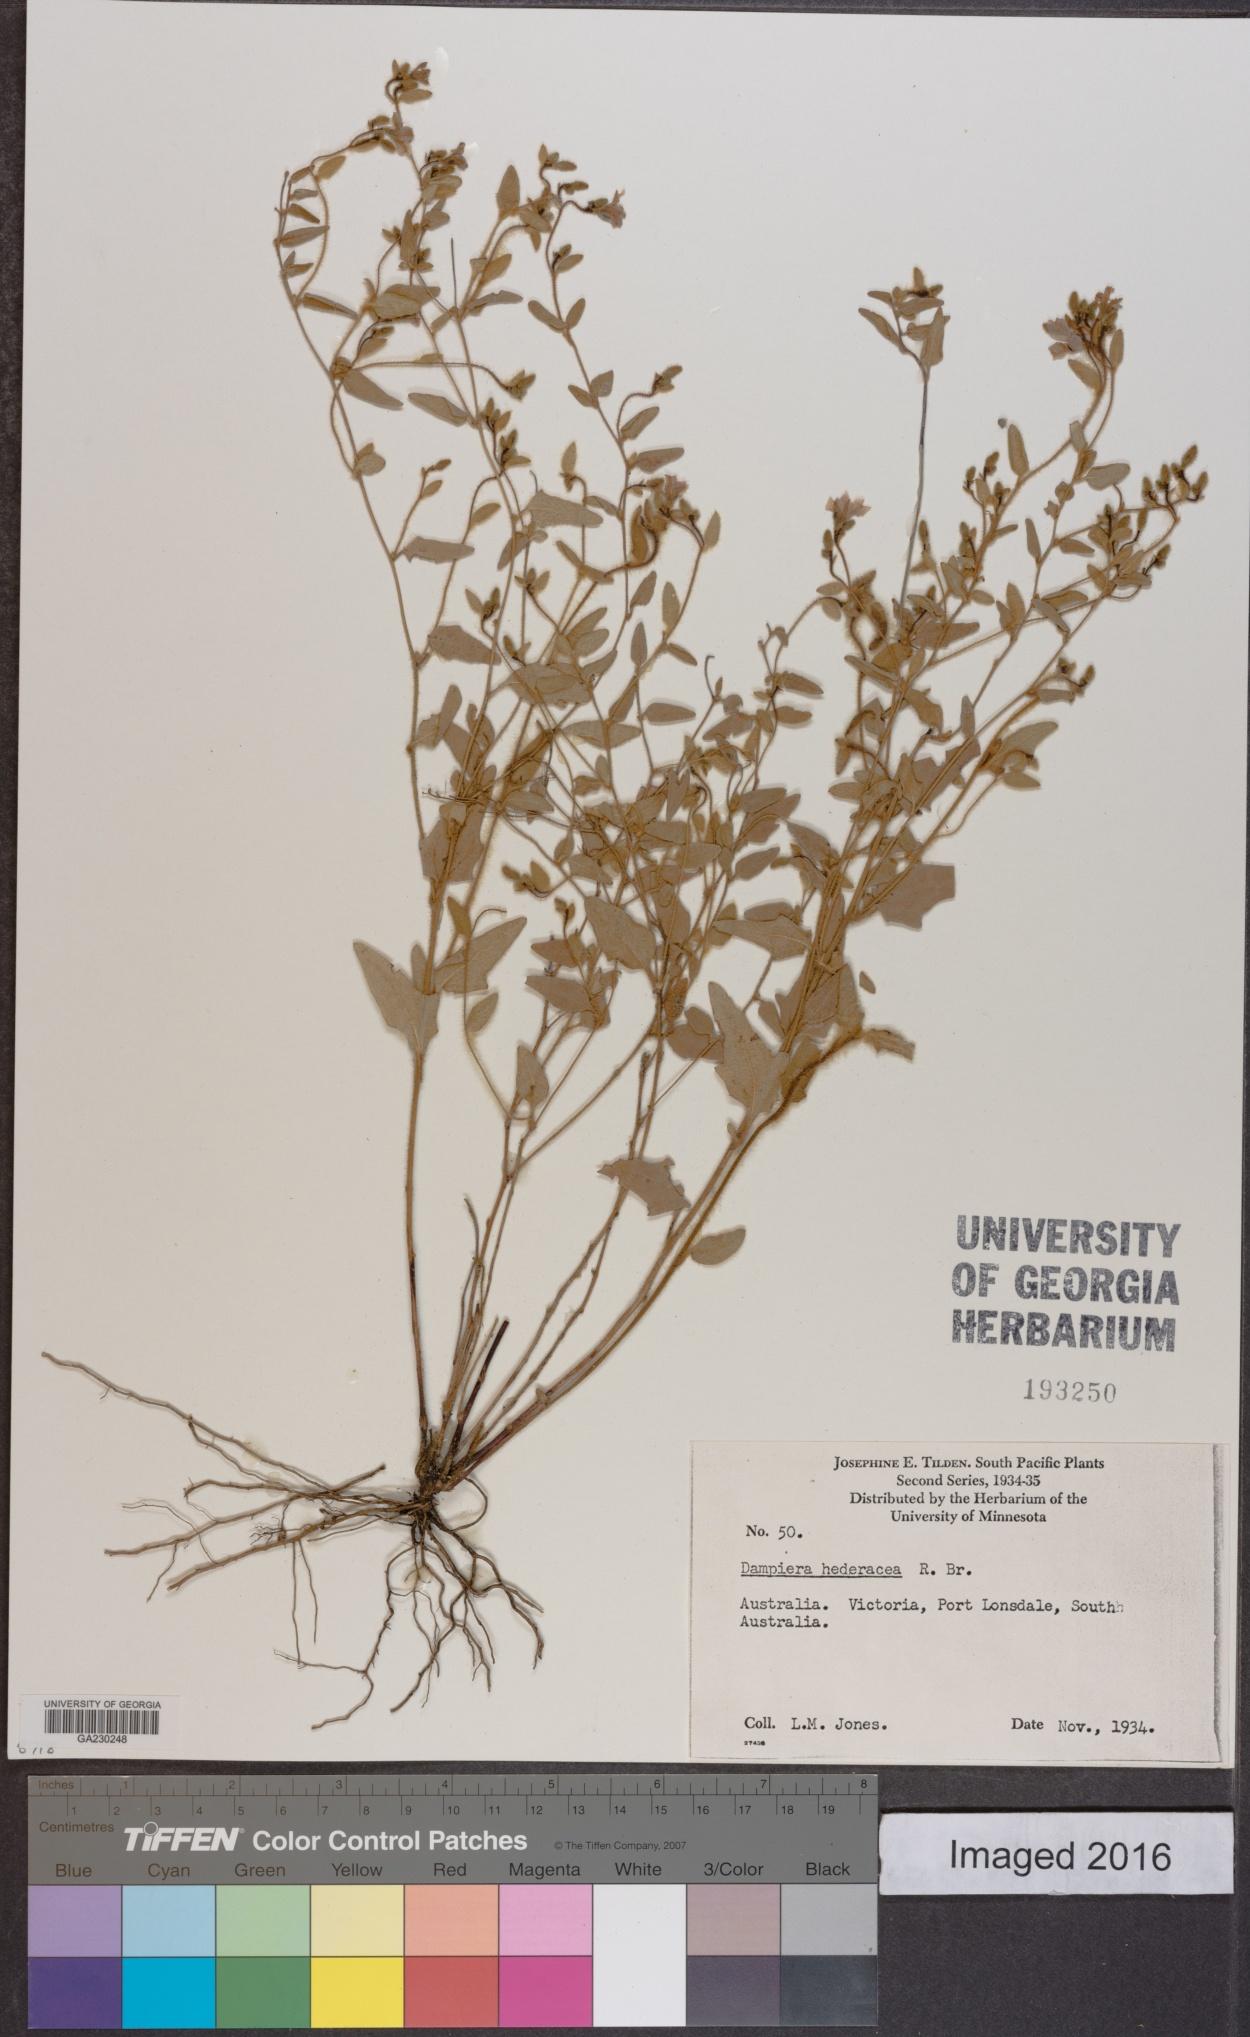 Dampiera hederacea image